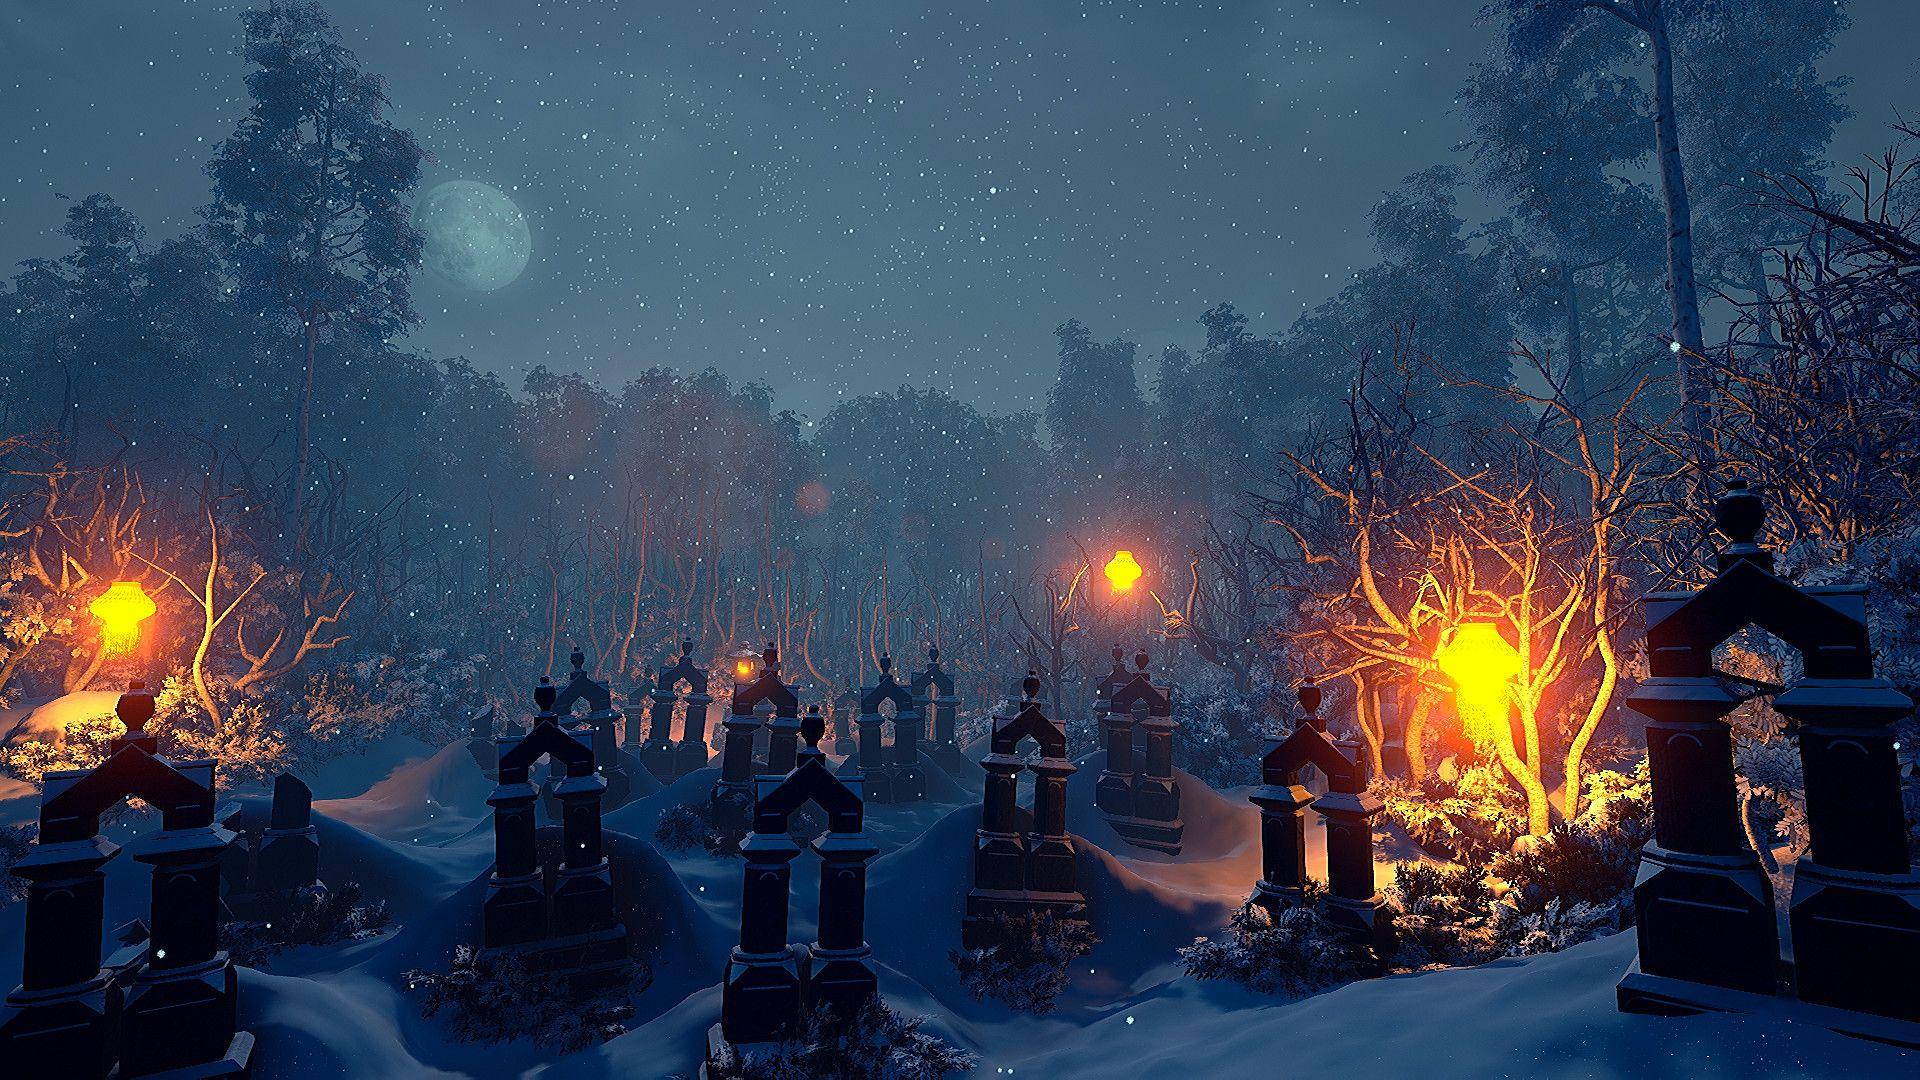 ArtStation - Frozen Kingdom, Justin Smith